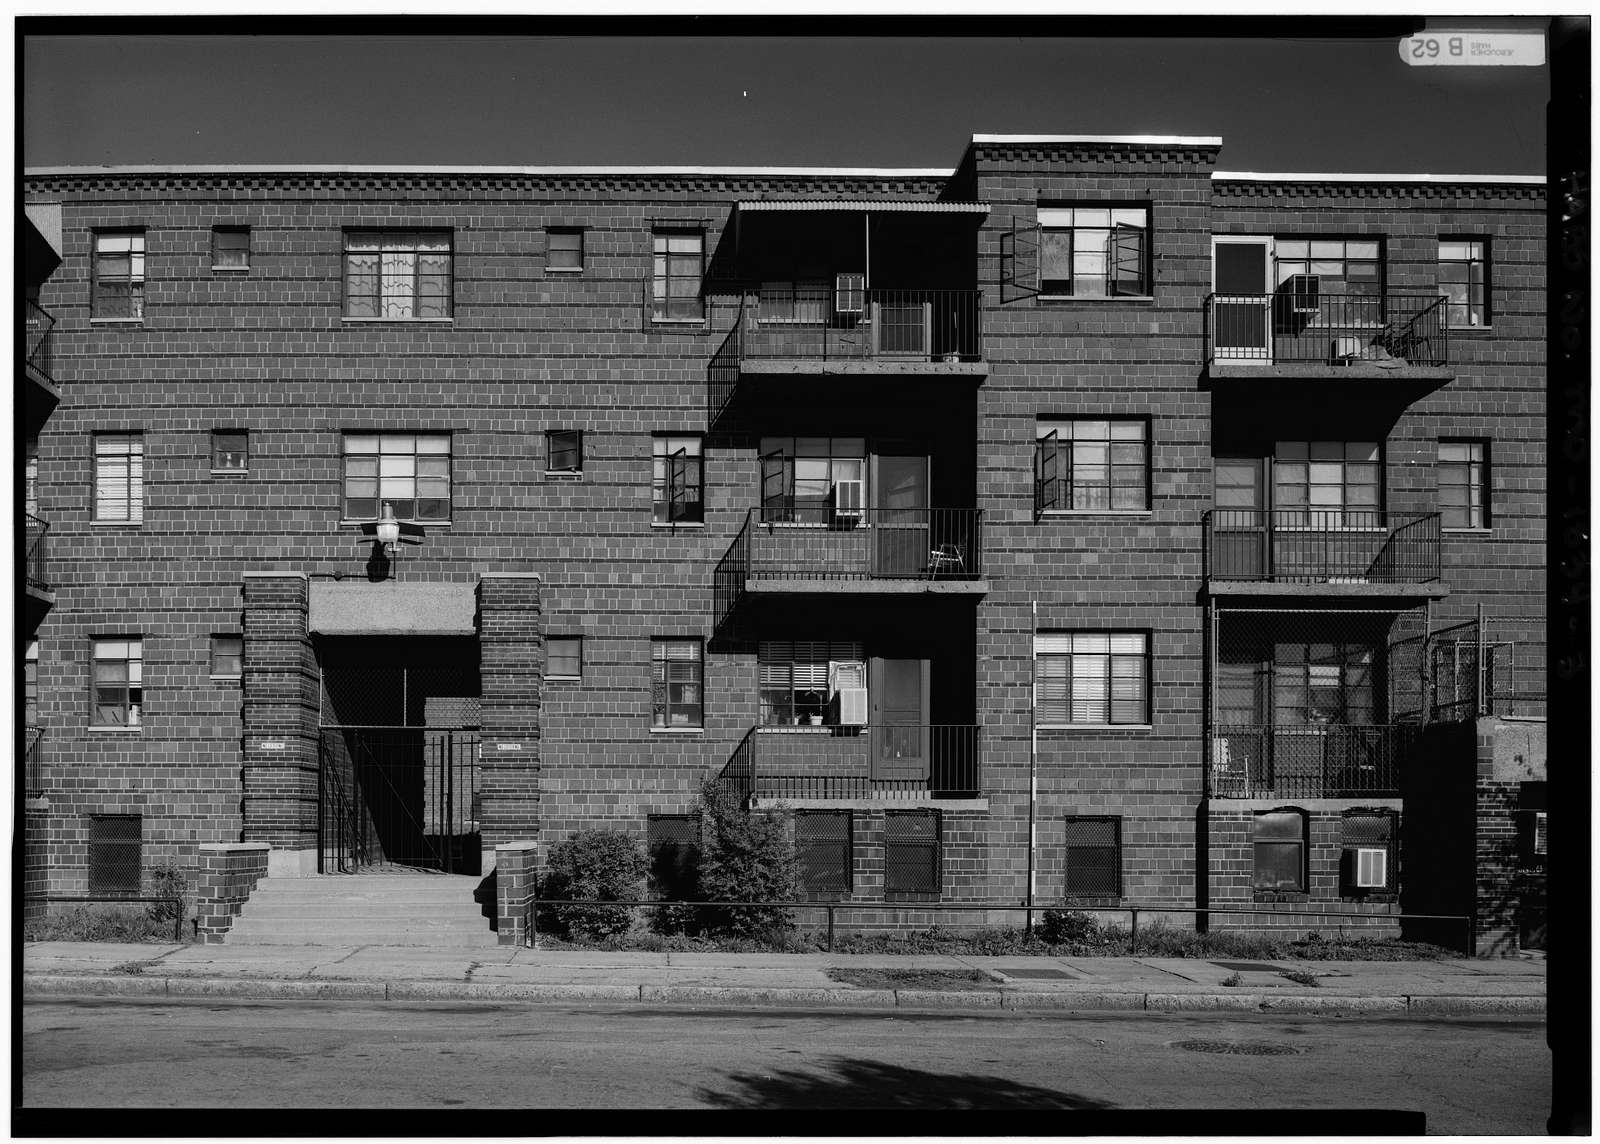 Neighborhood Gardens, Eighth Street between Biddle & O'Fallon Streets, Saint Louis, Independent City, MO